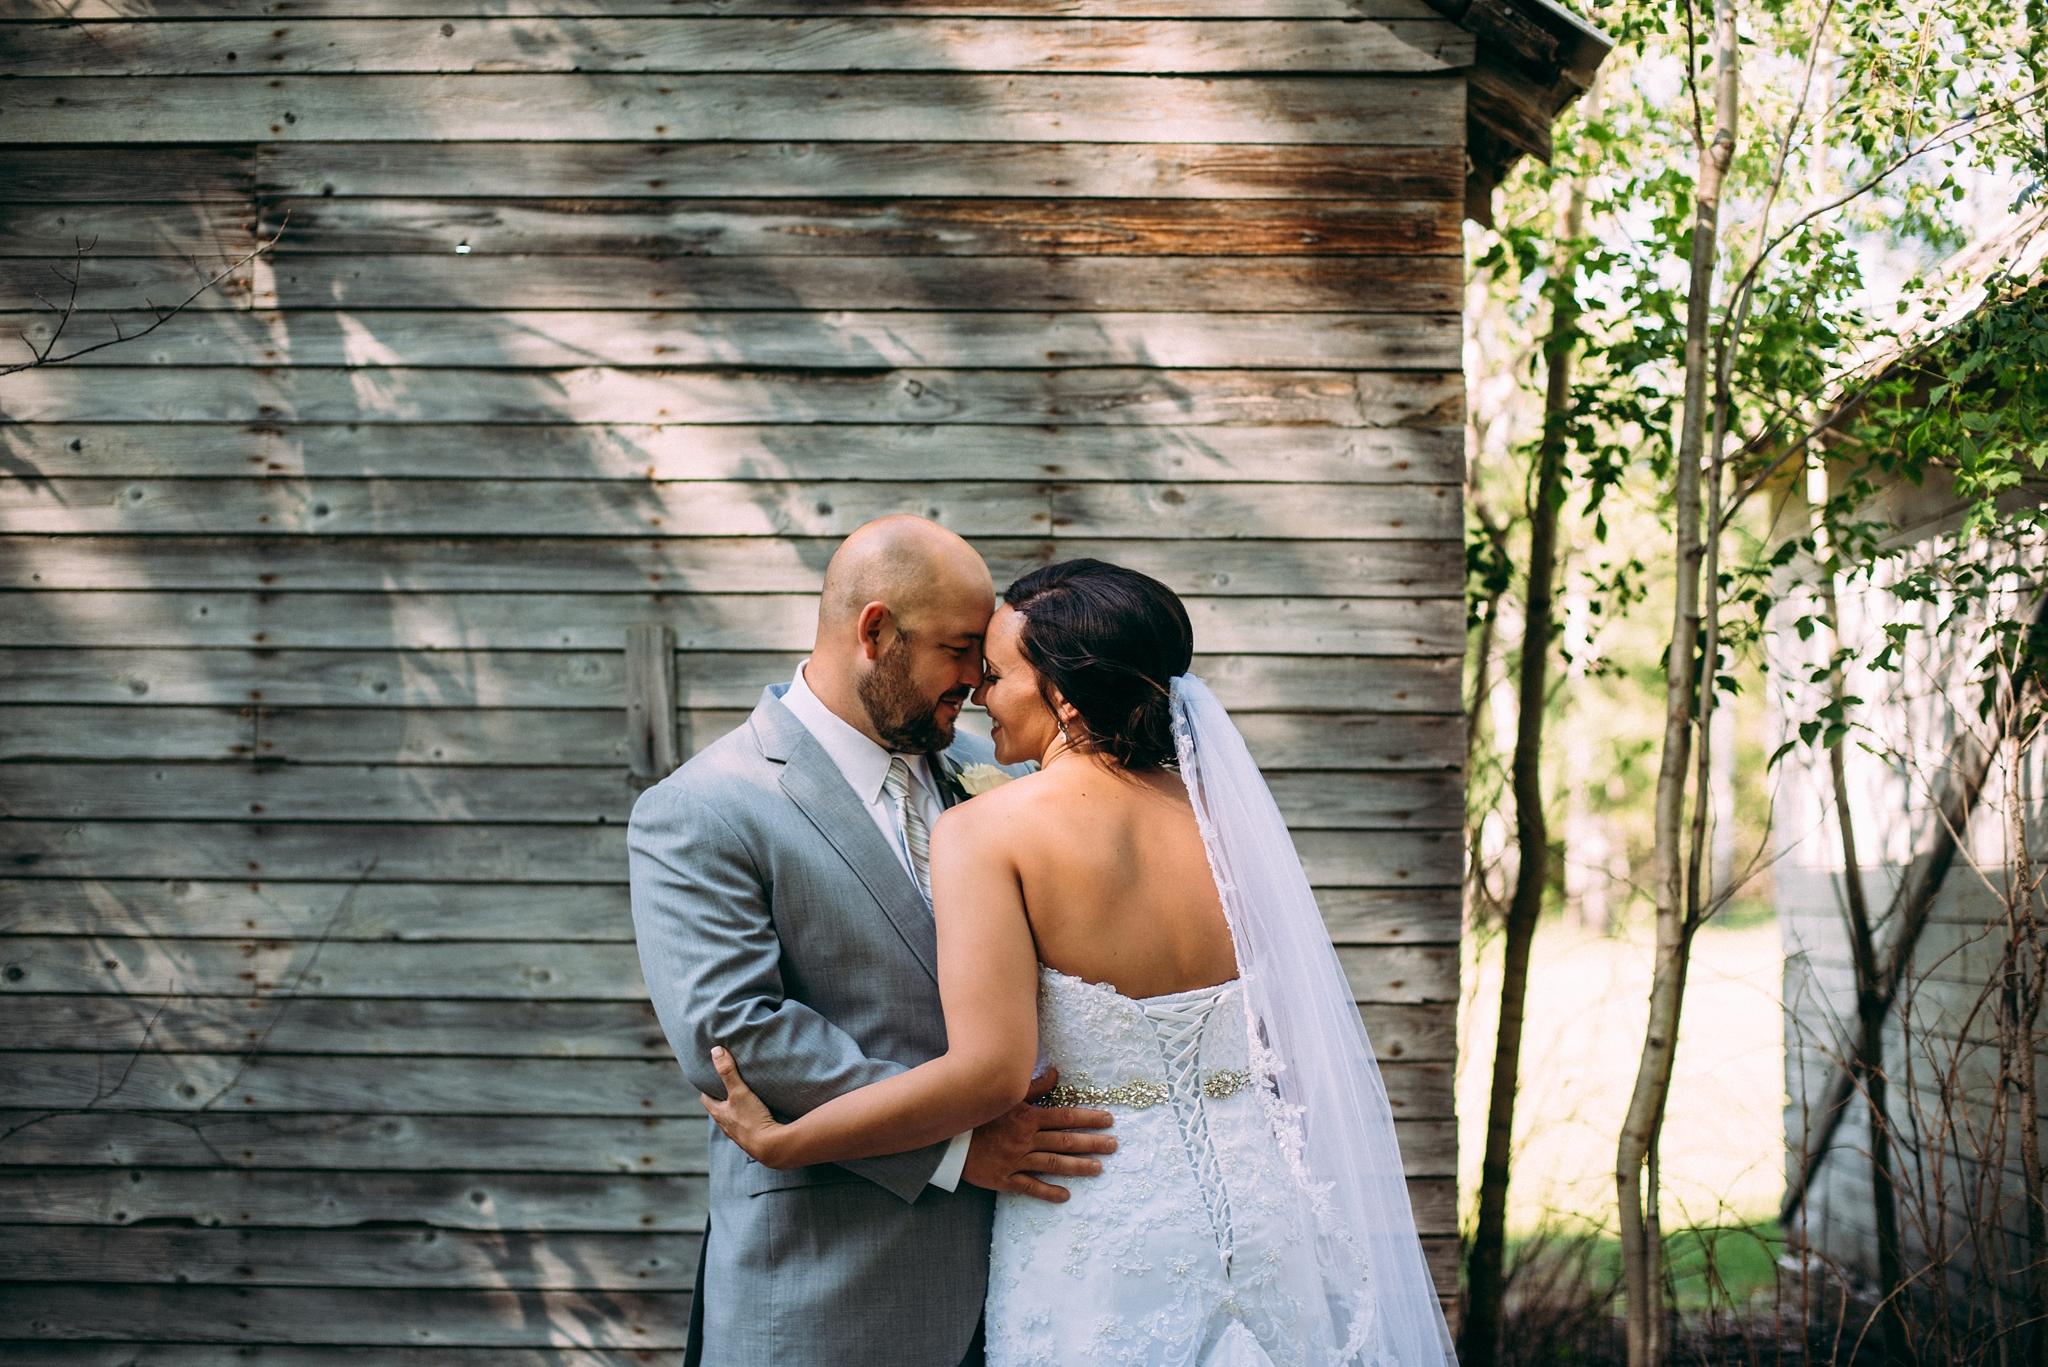 kaihla_tonai_intimate_wedding_elopement_photographer_1546